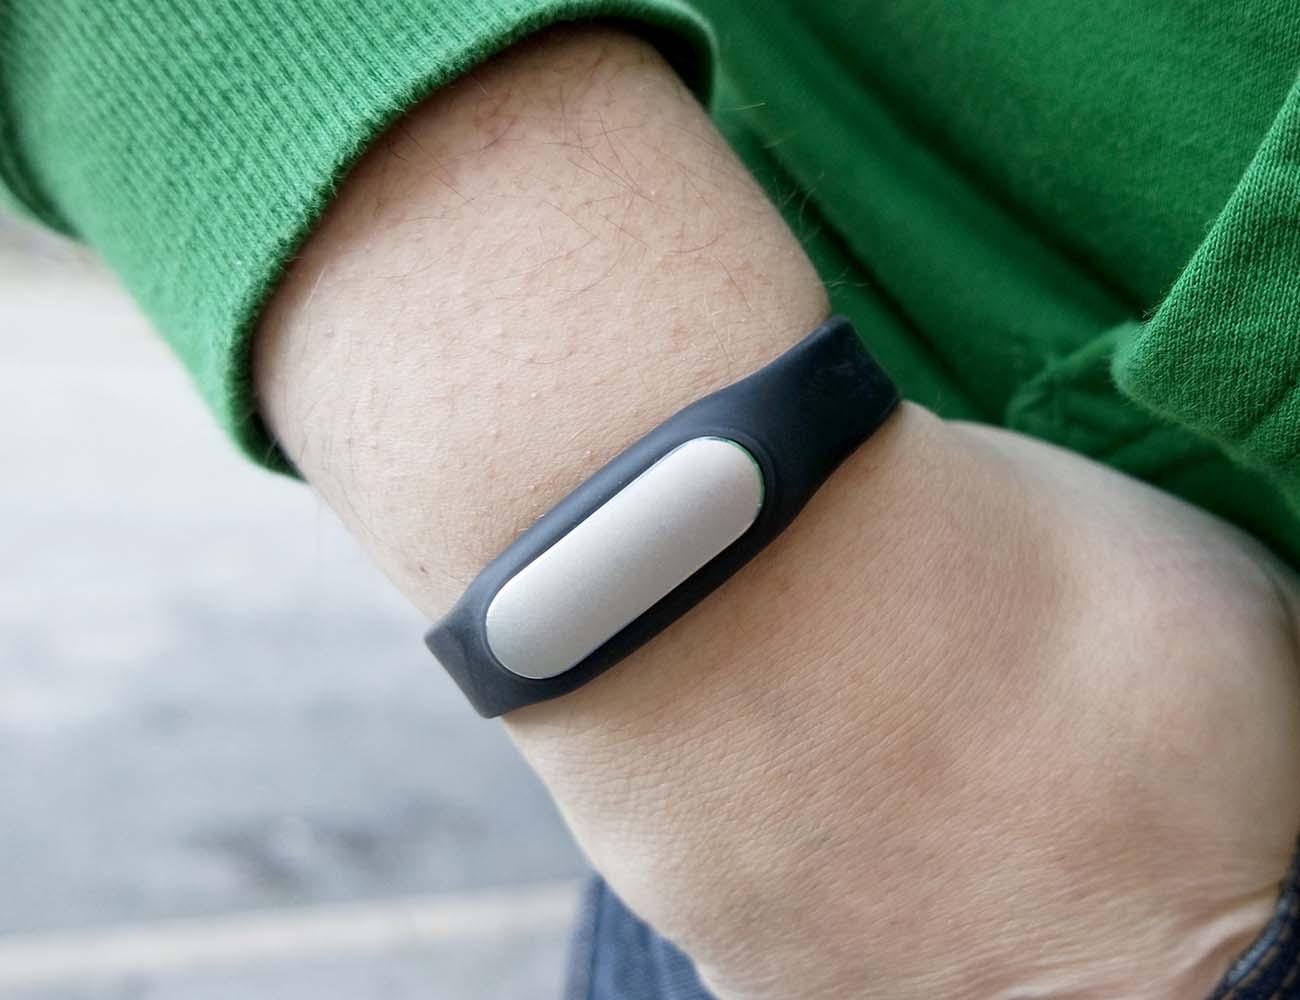 Xiaomi Mi Band With An Optical Heart Rate Sensor